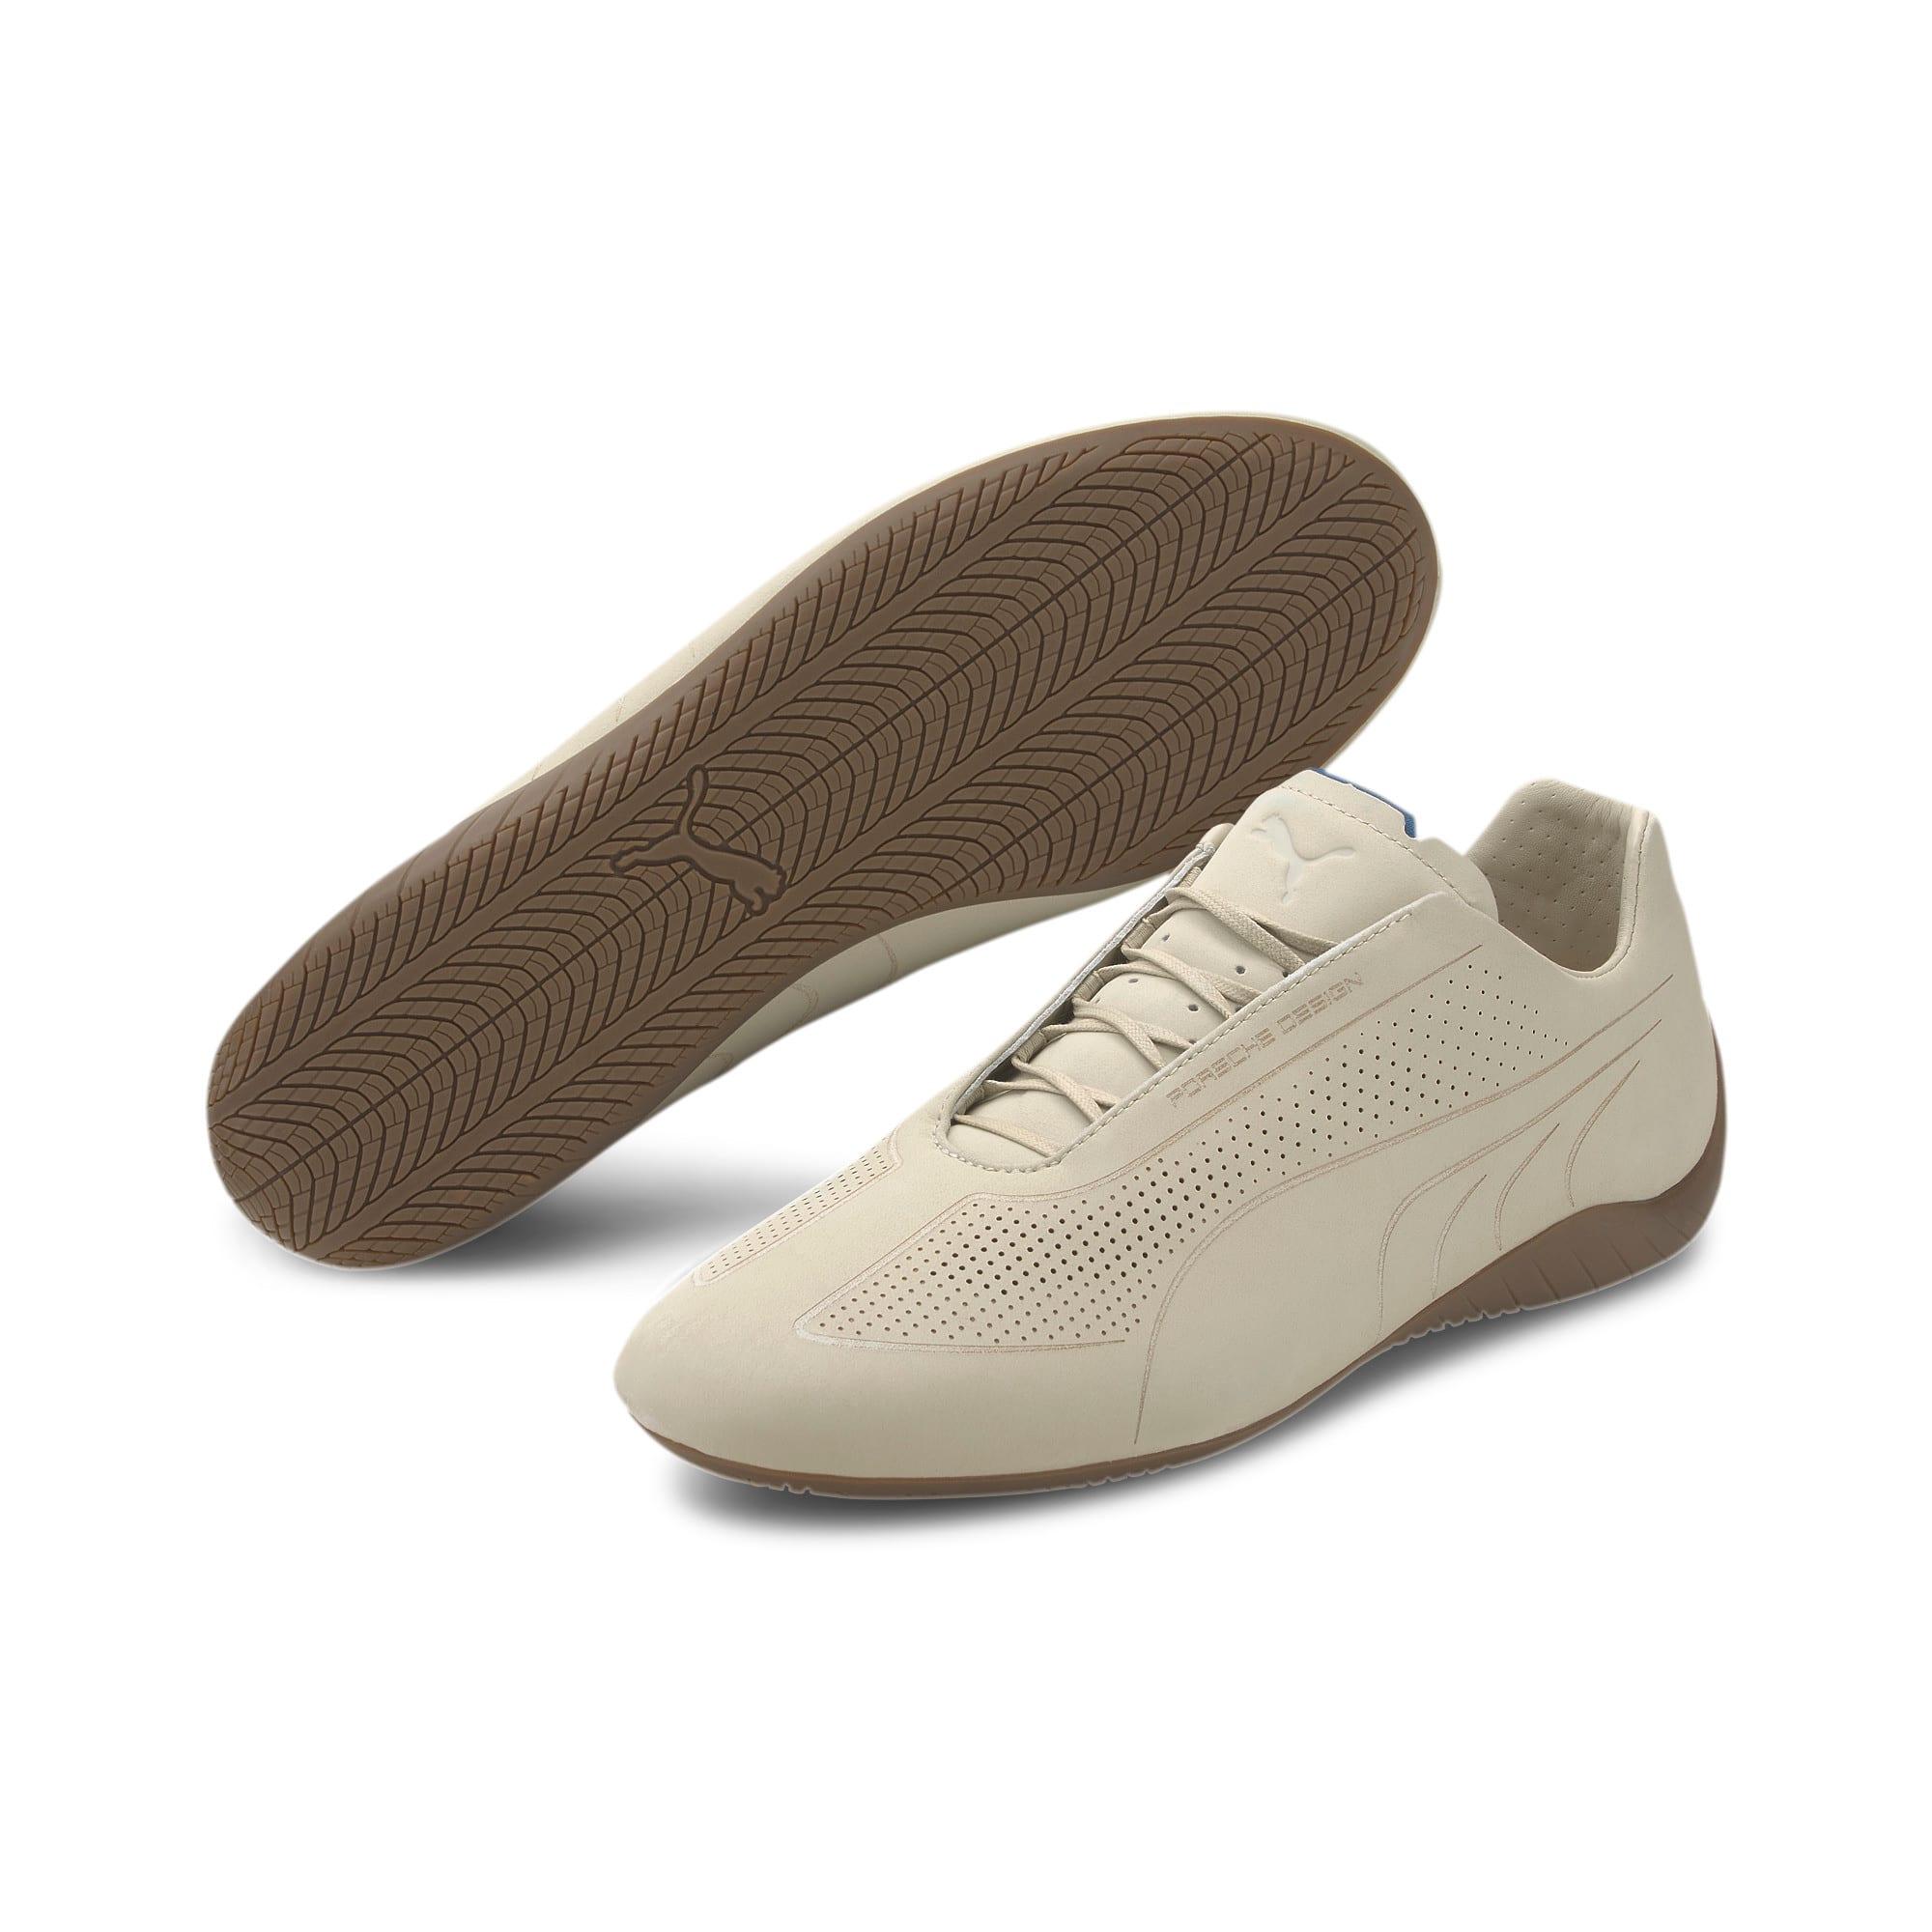 Thumbnail 2 of Porsche Design Speedcat Lux Nubuck Men's Shoes, Overcast-Overcast, medium